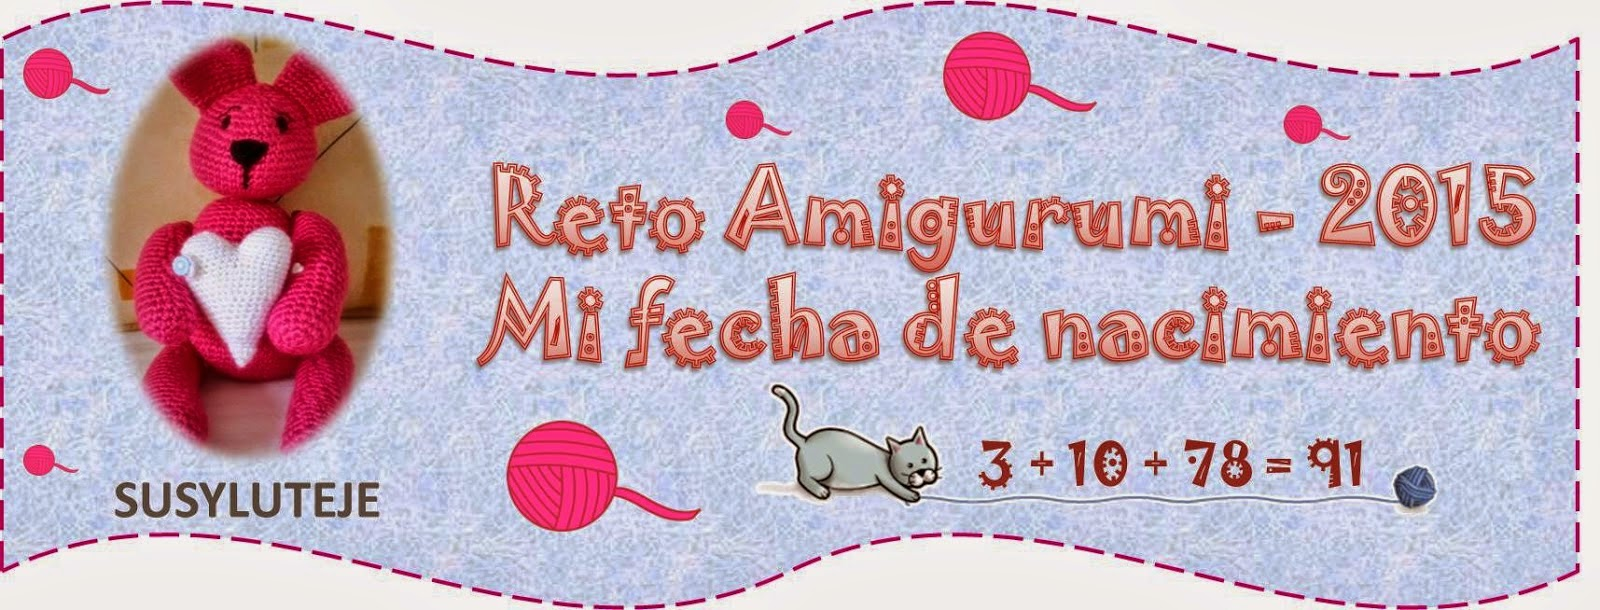 RETO AMIGURUMI ♥